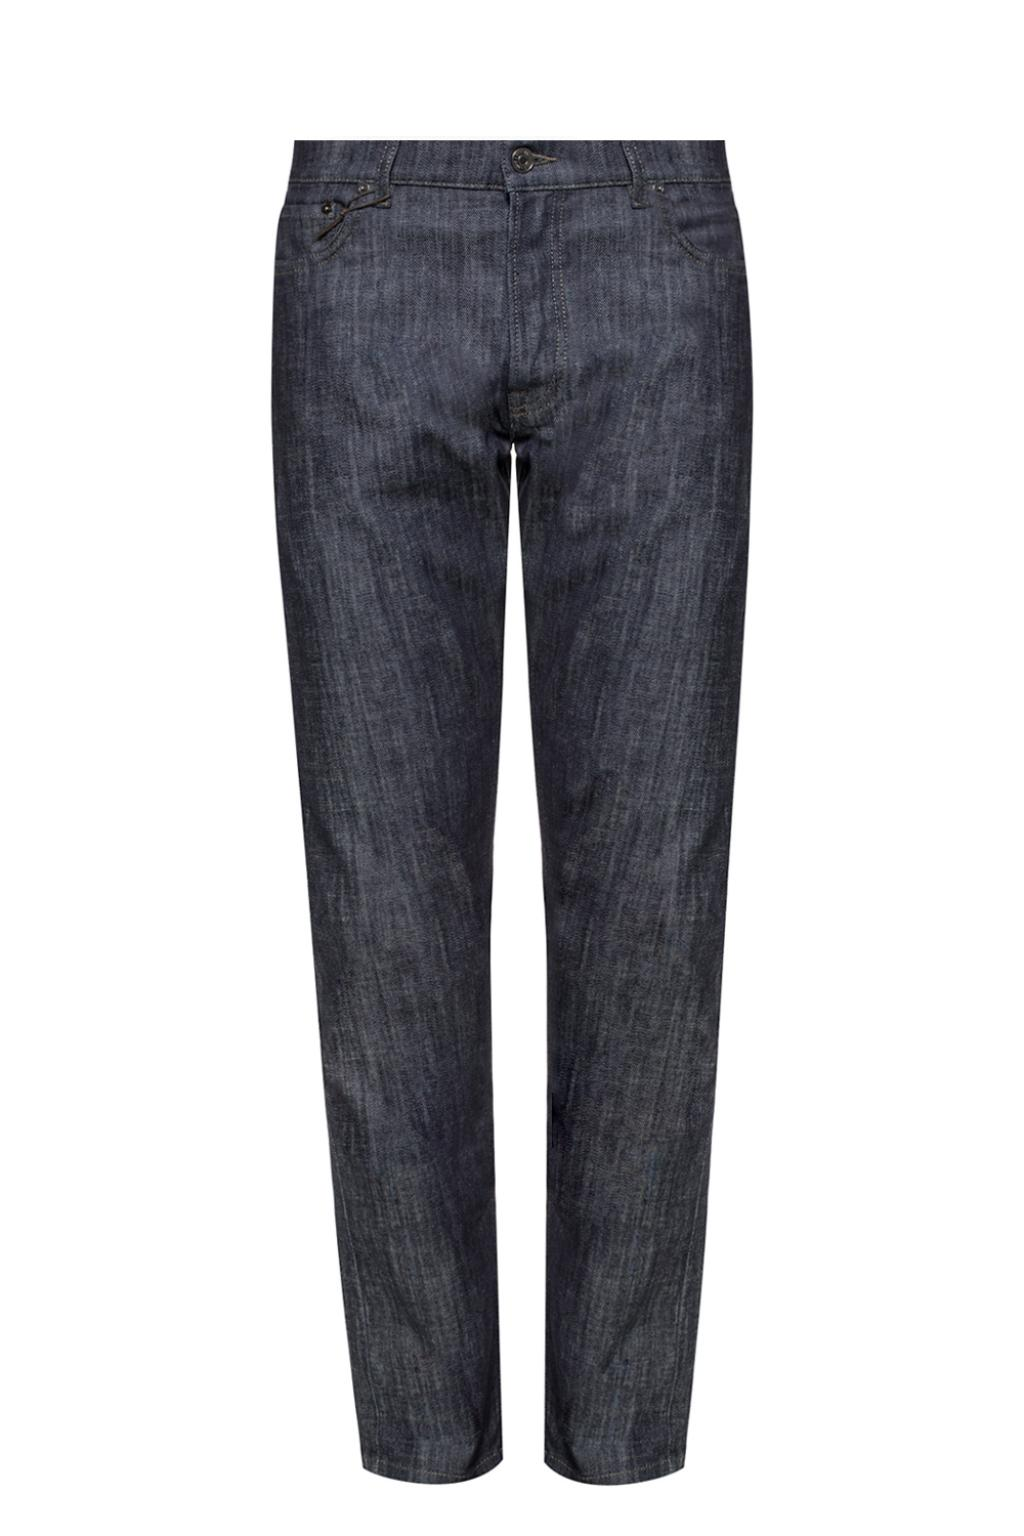 Berluti Tapered leg jeans